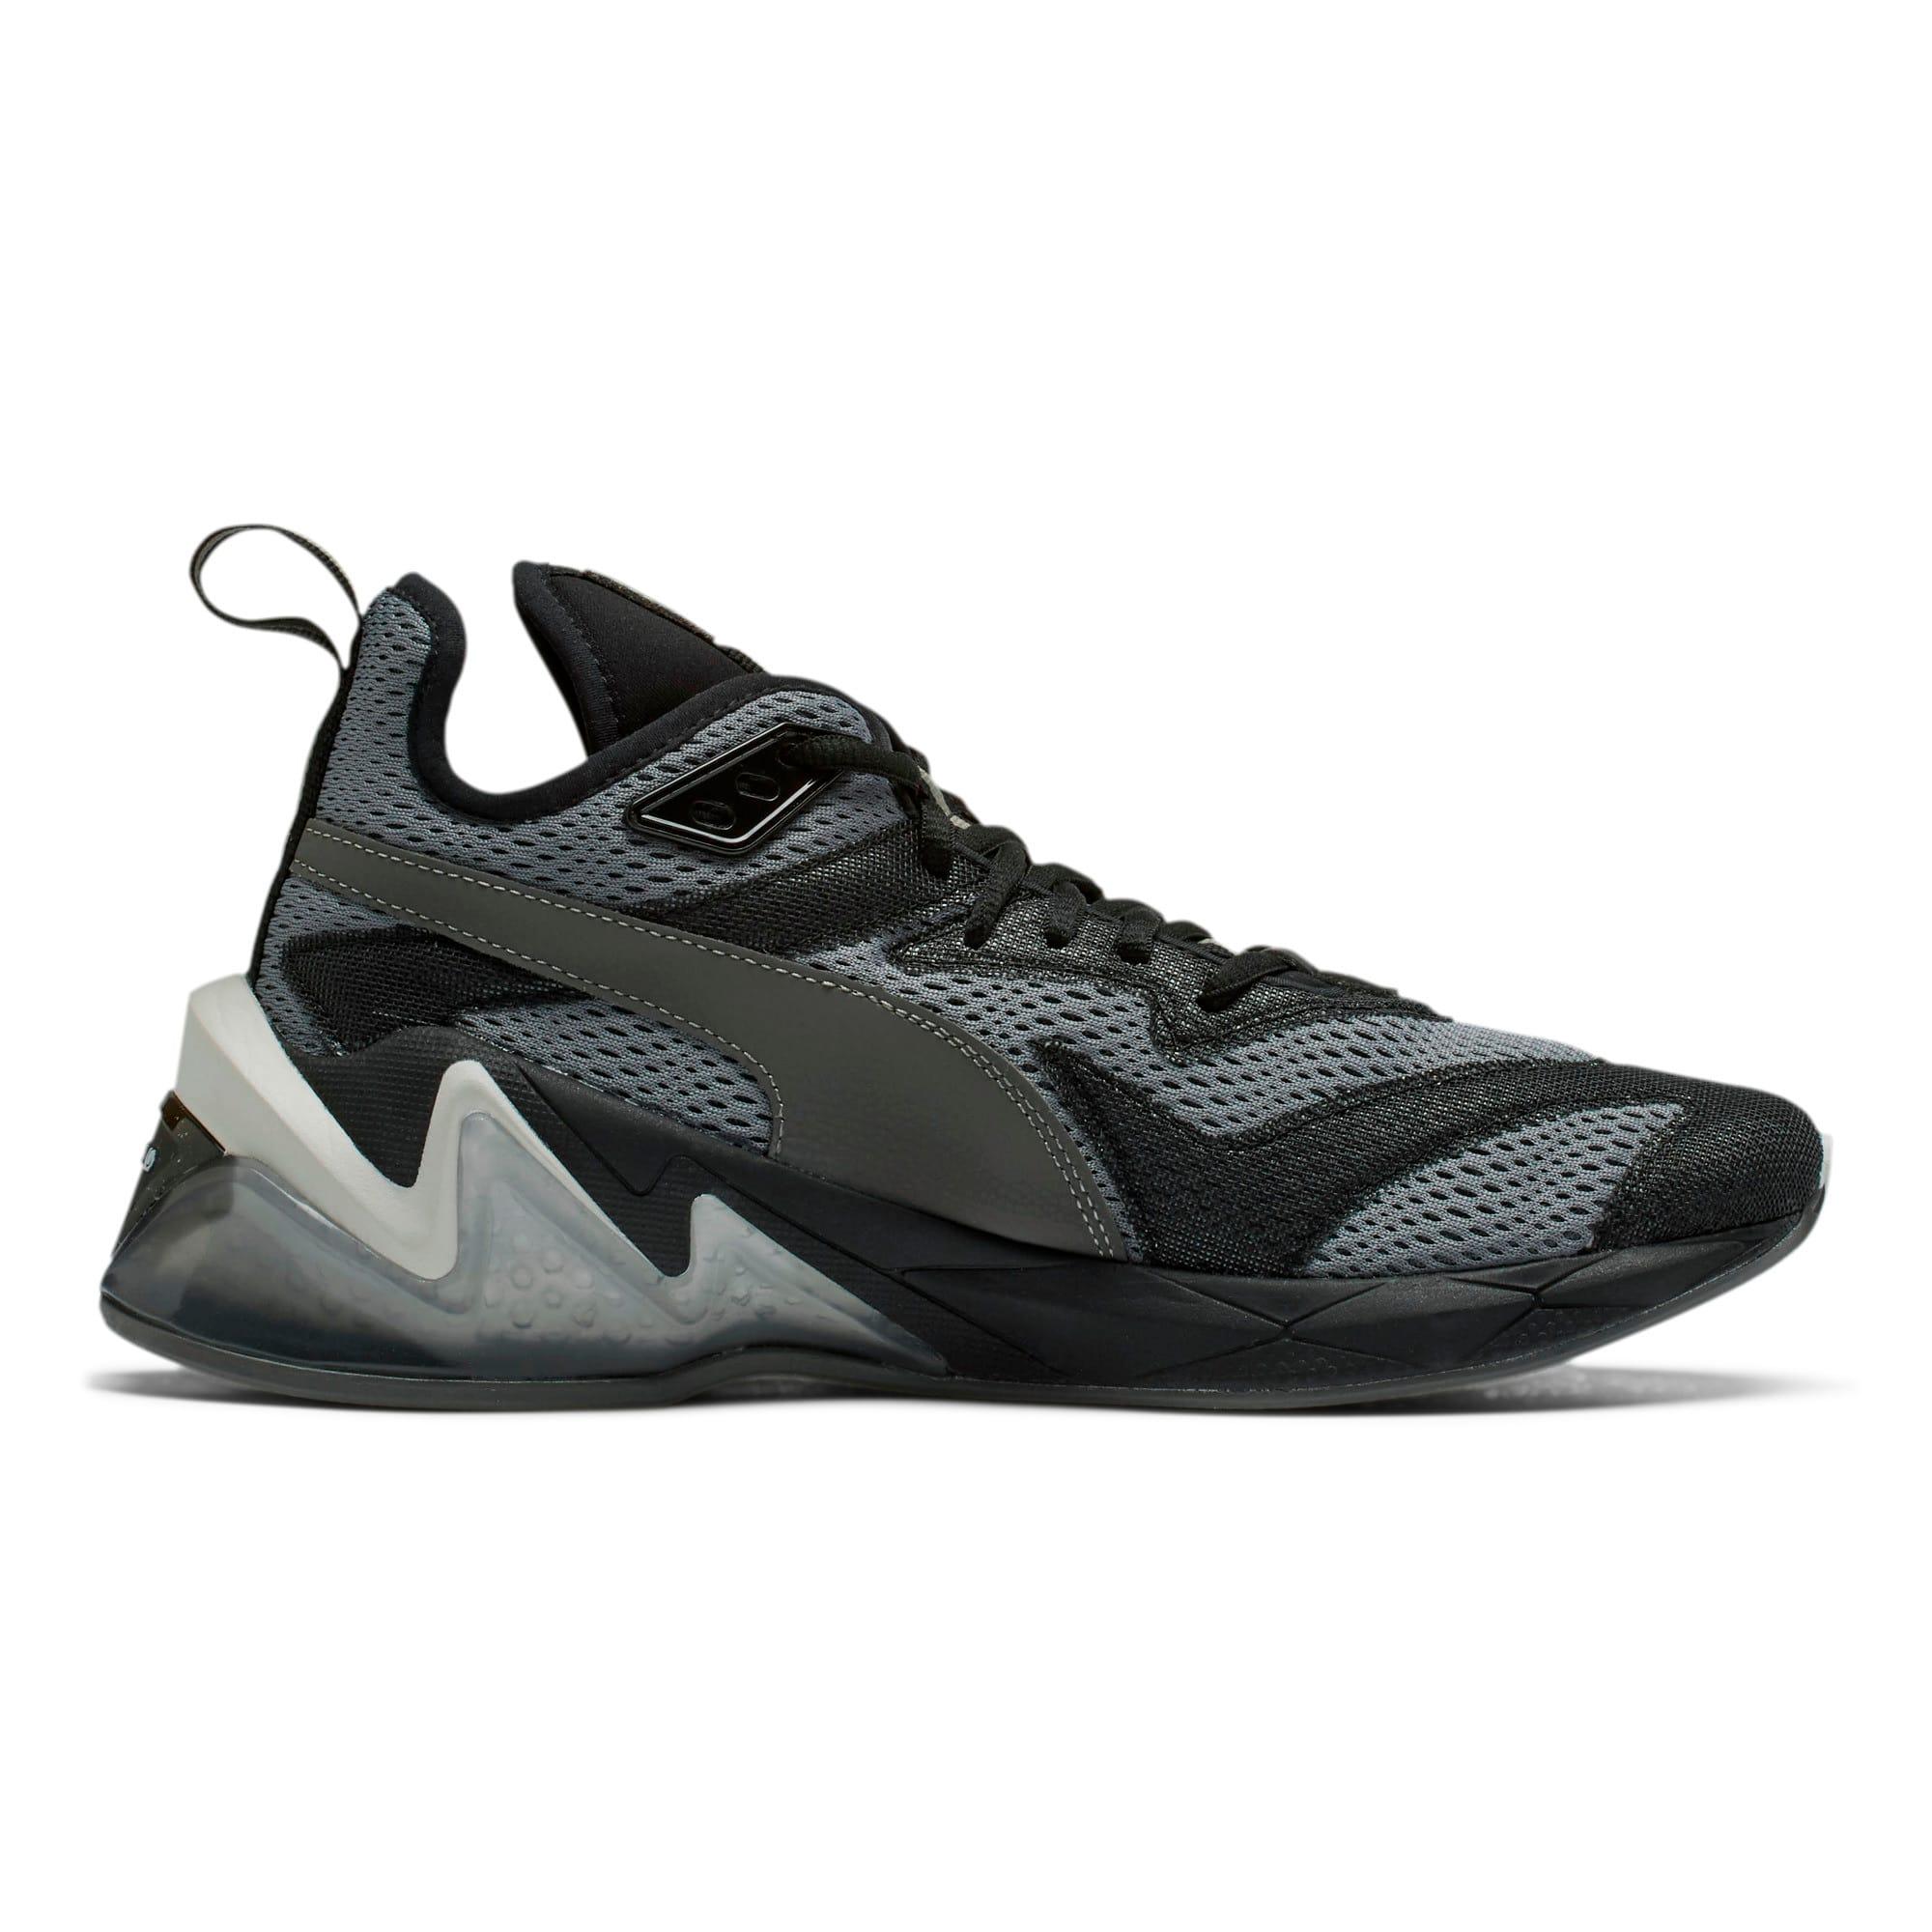 Thumbnail 6 of LQDCELL Origin Tech Men's Training Shoes, Puma Black-CASTLEROCK, medium